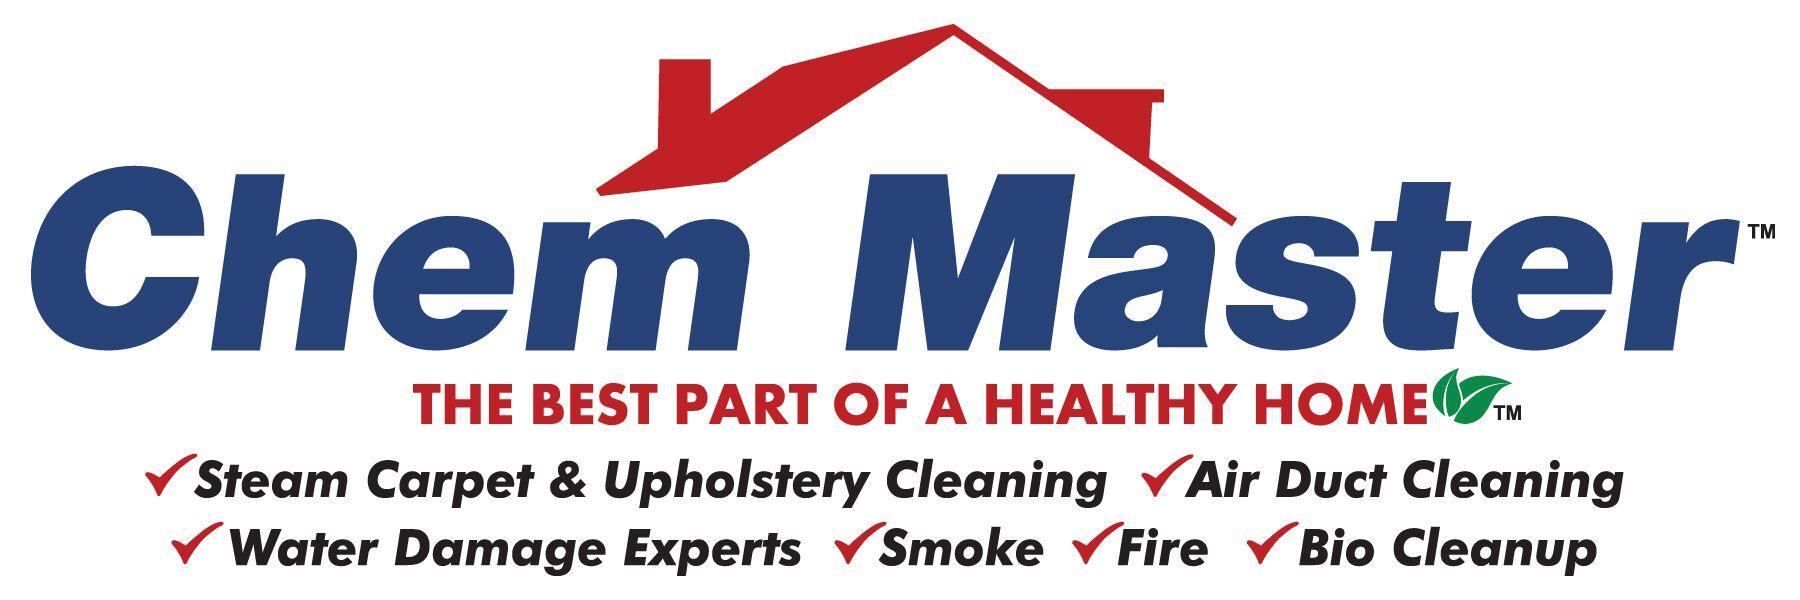 Chem Master Carpet Cleaning And Restoration image 8